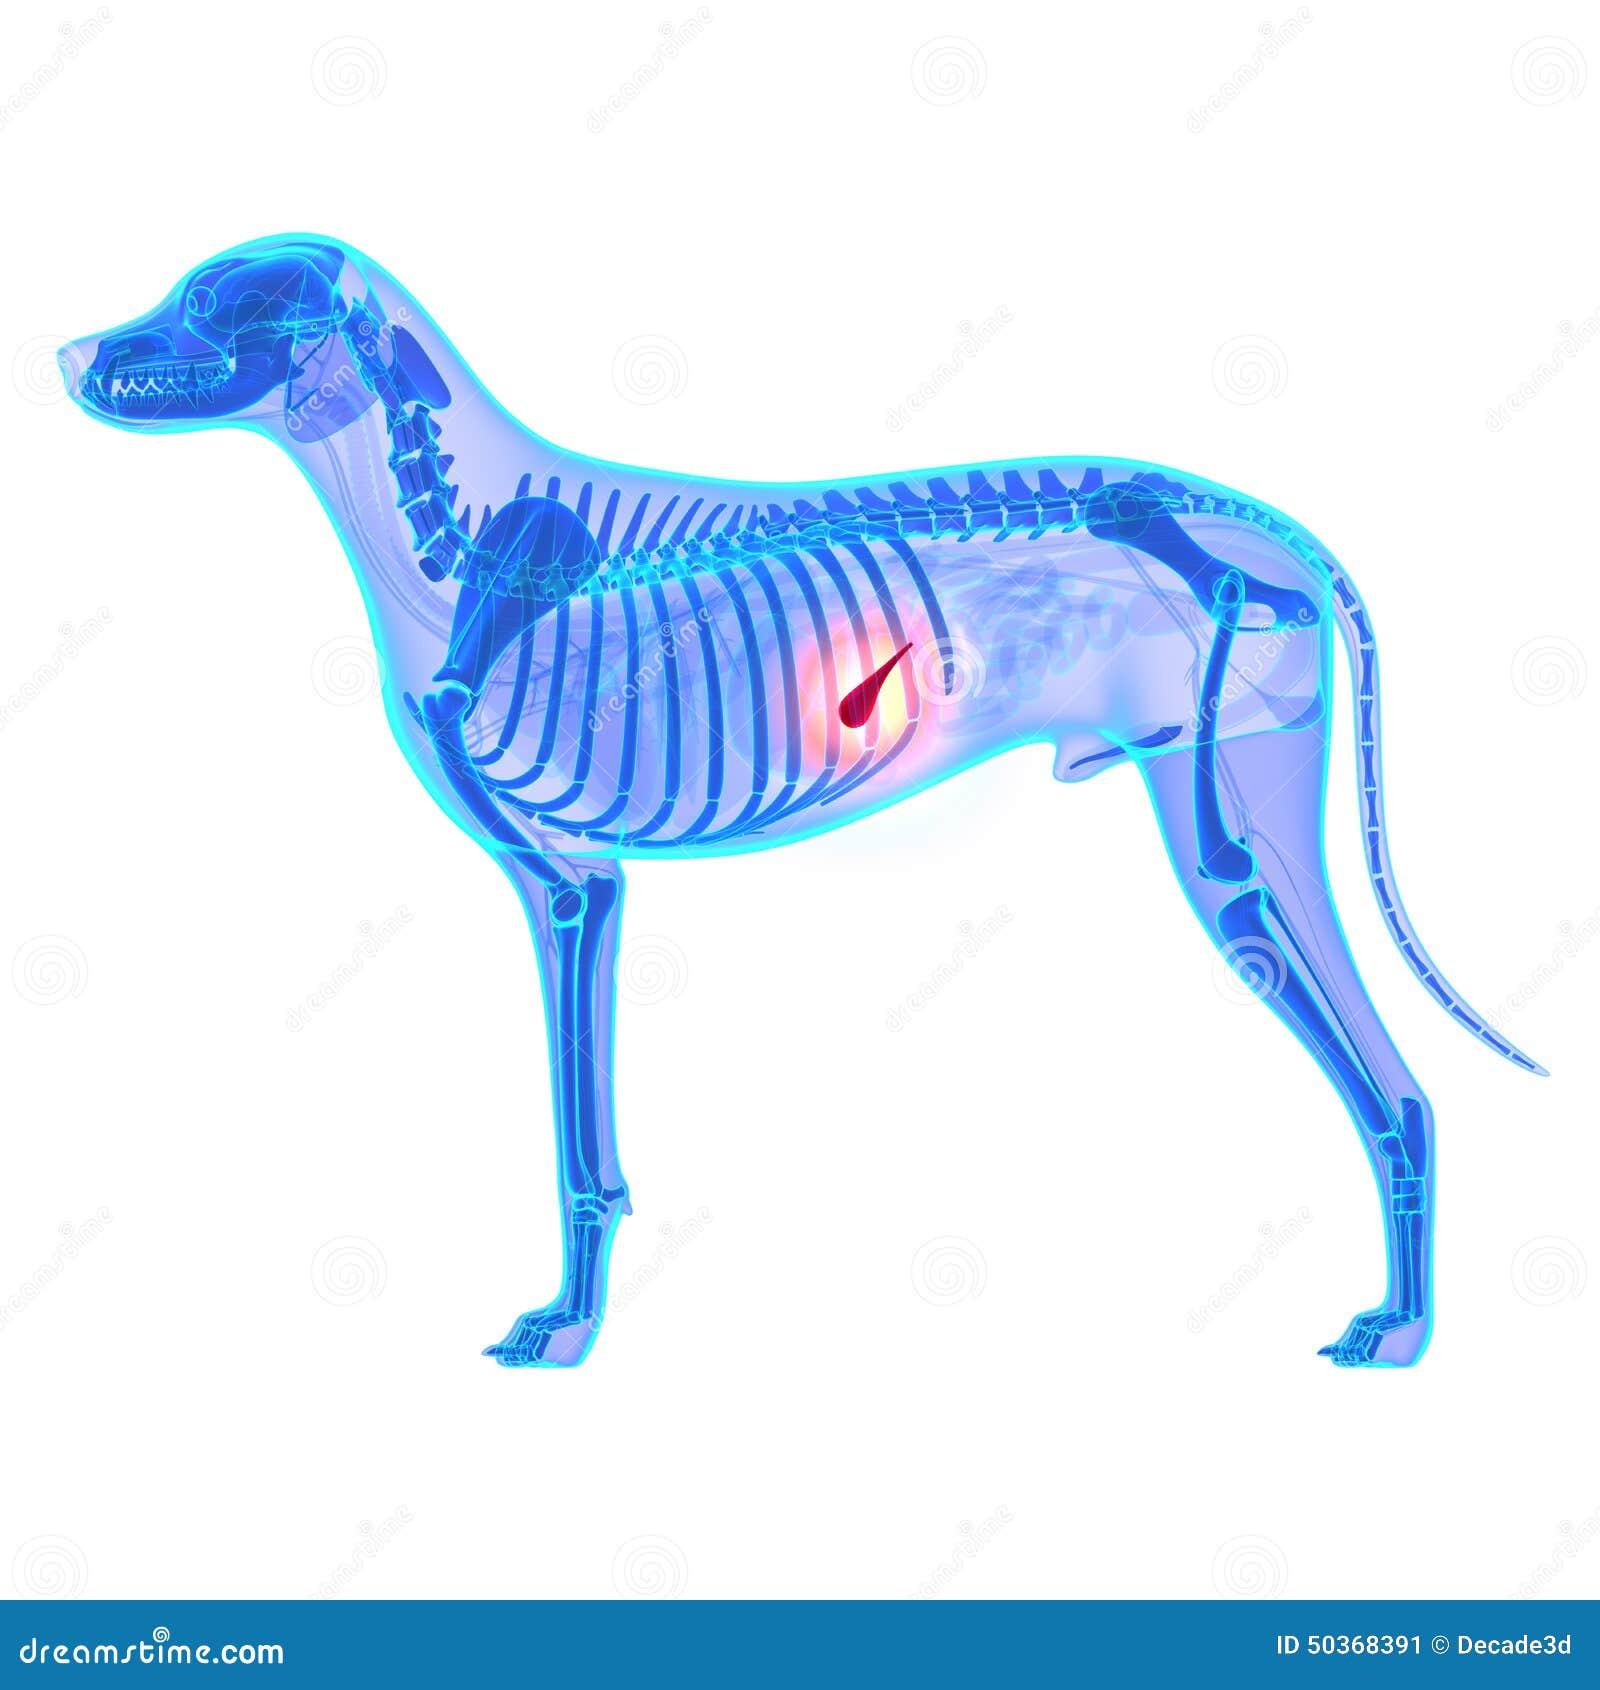 Cow Lung Anatomy Choice Image - human body anatomy